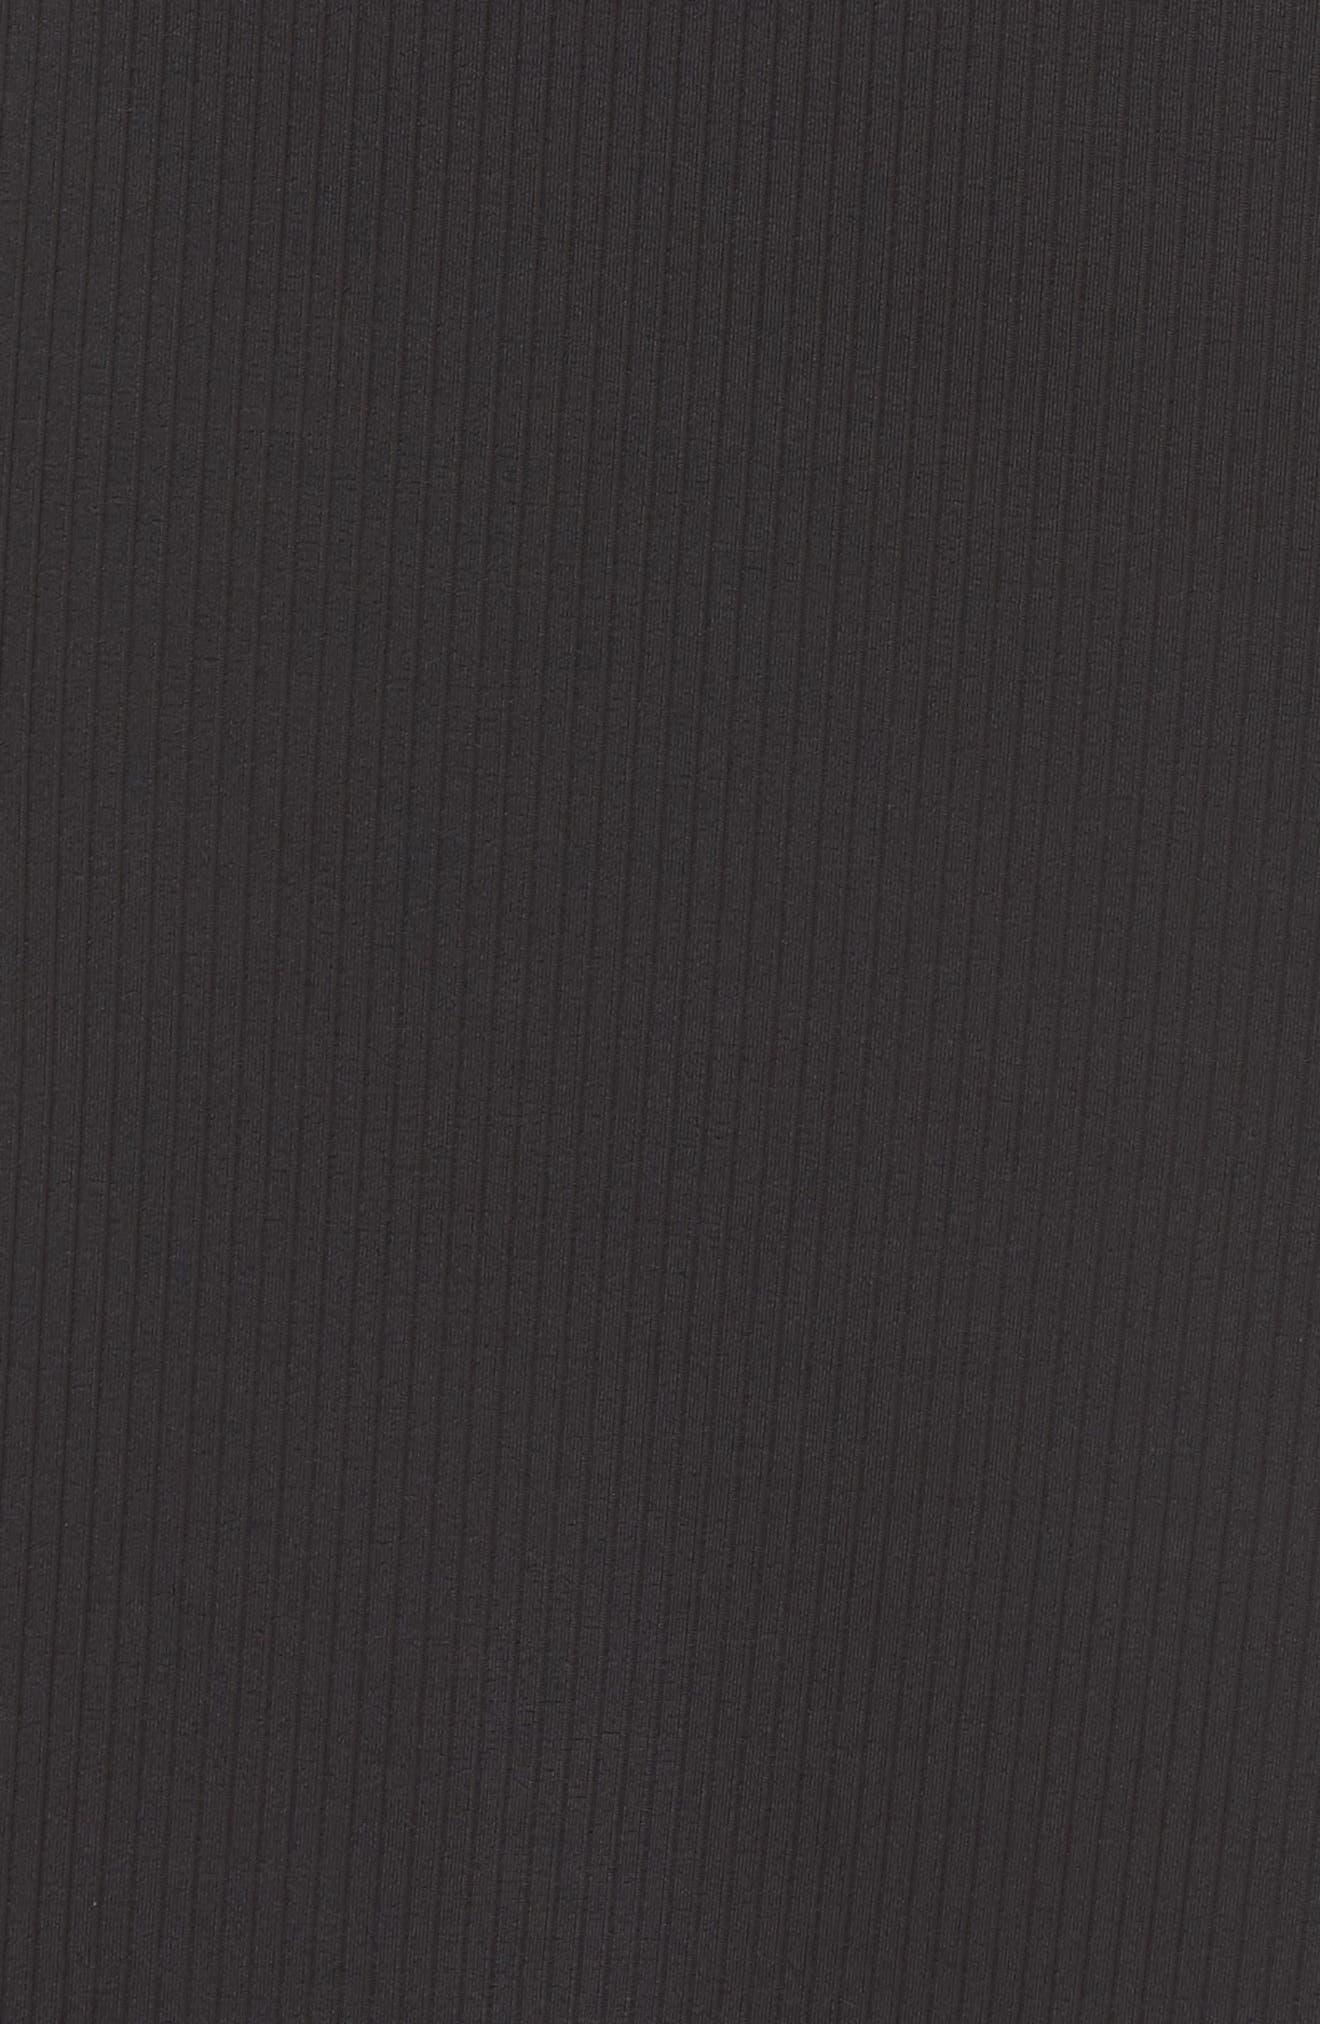 PUMA,                             Classics Ribbed Skirt,                             Alternate thumbnail 6, color,                             PUMA BLACK